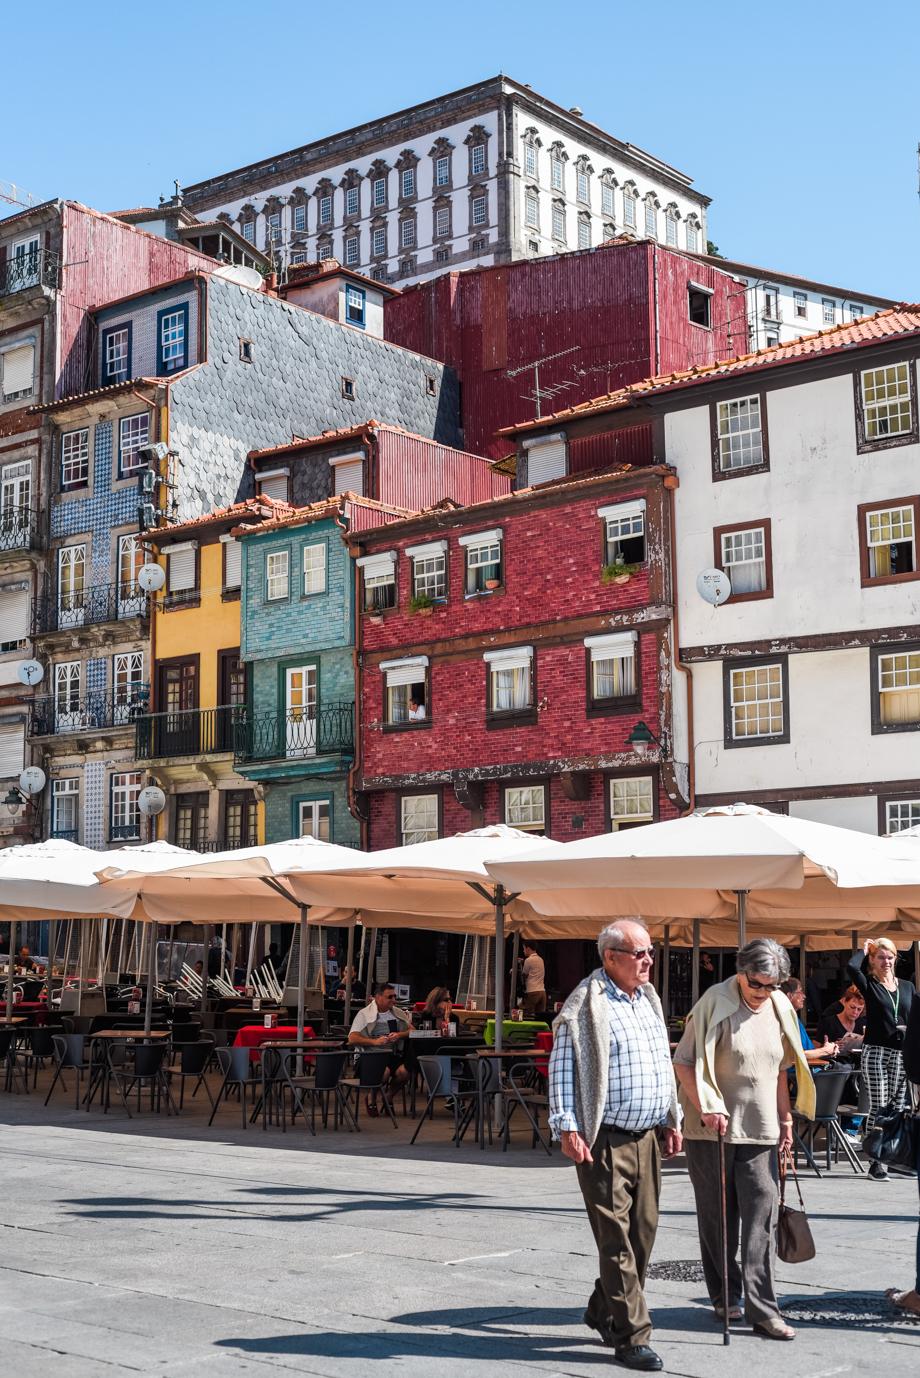 WebQuality-Porto-10yearsVentigrate-AnaisStoelenPhotography-136.jpg